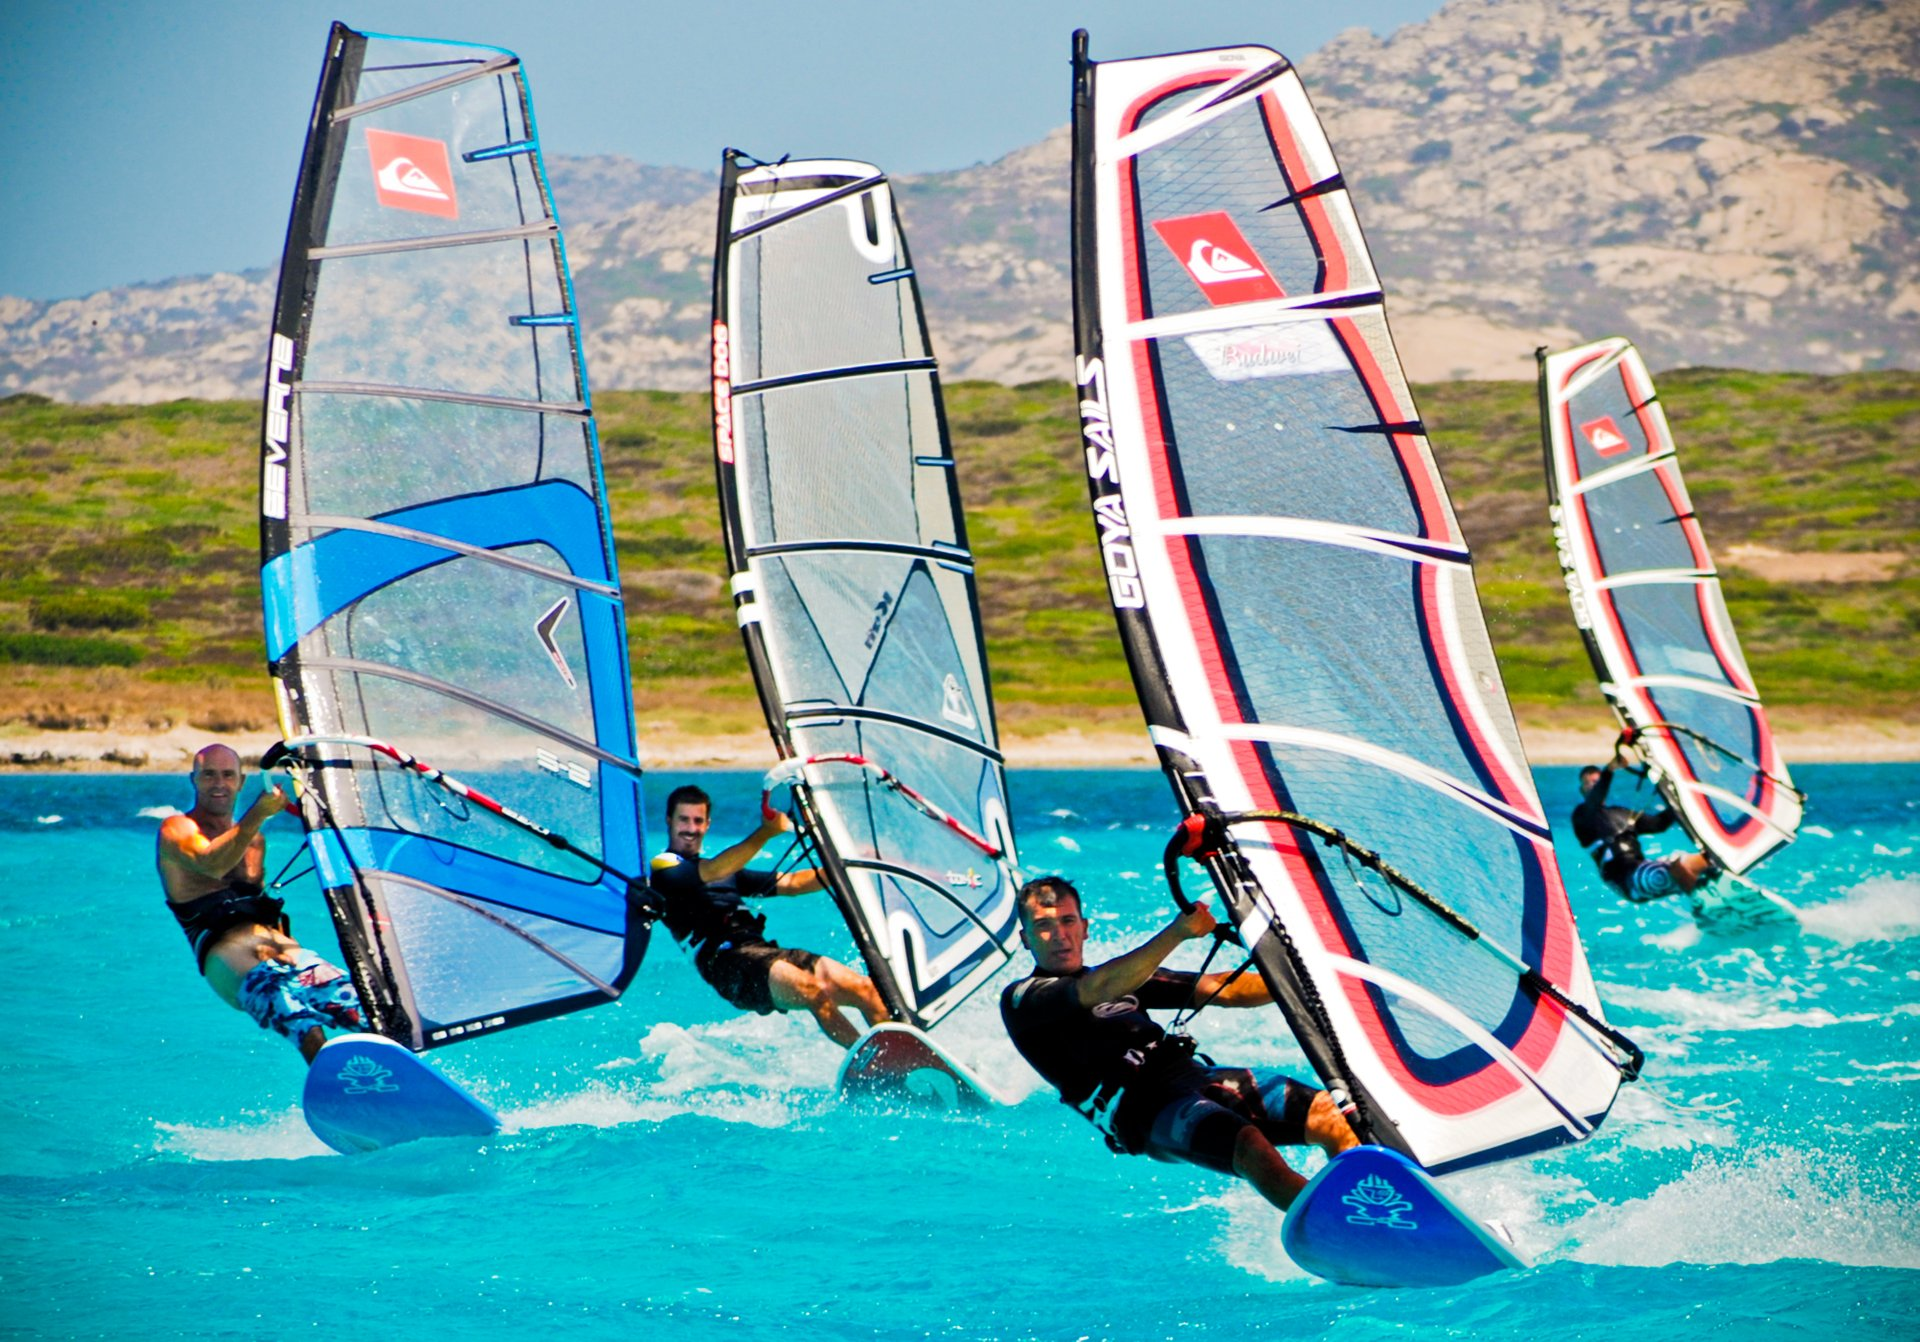 Kitesurfing & Windsurfing in Italy 2020 - Best Time